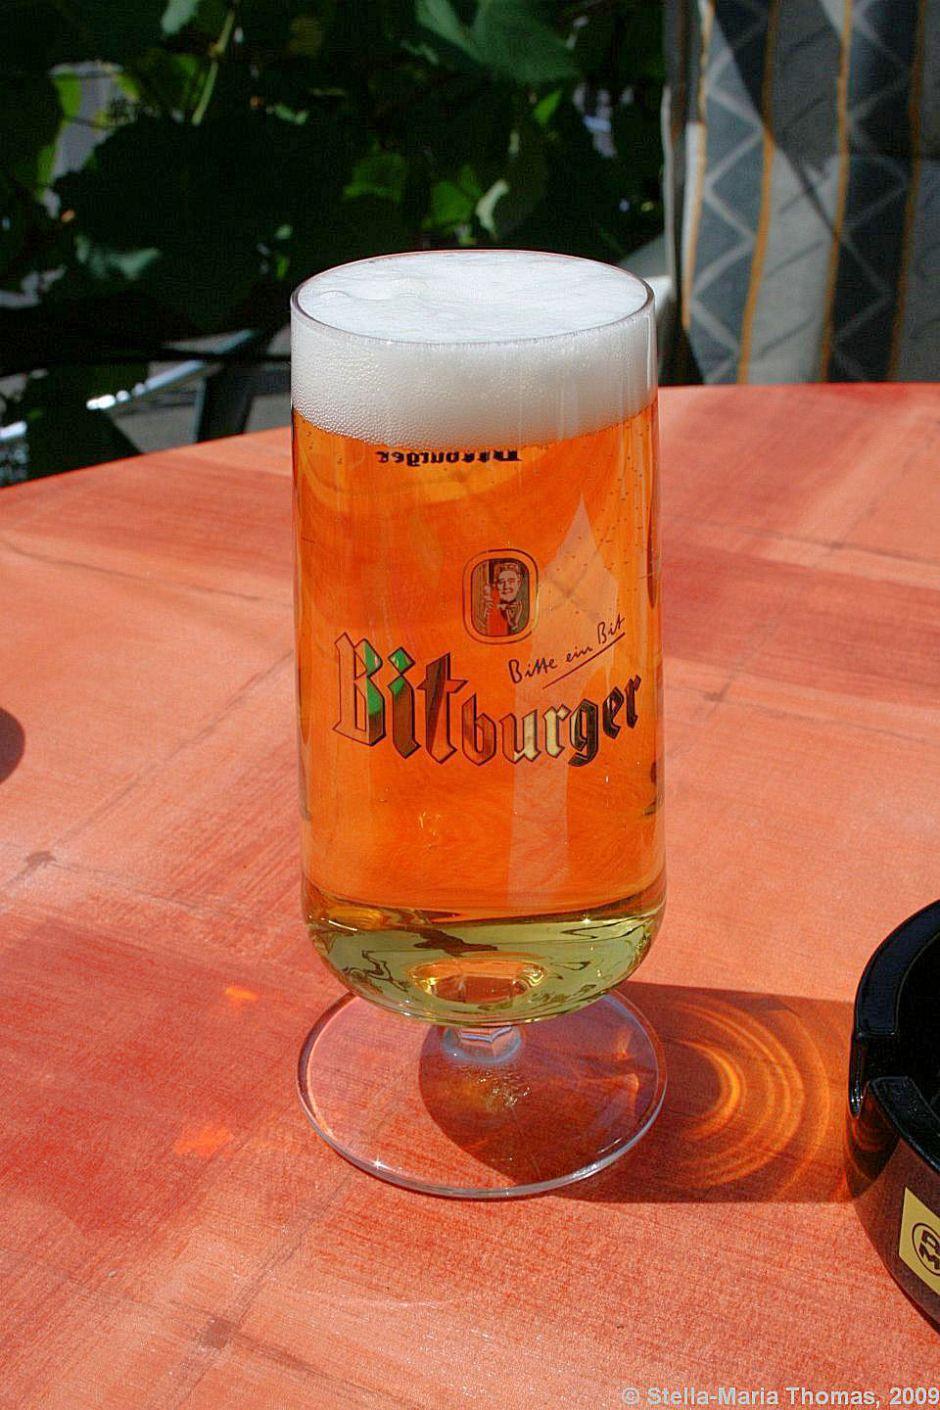 aacher-hof-traben-trarbach-bitburger-002_3617428517_o